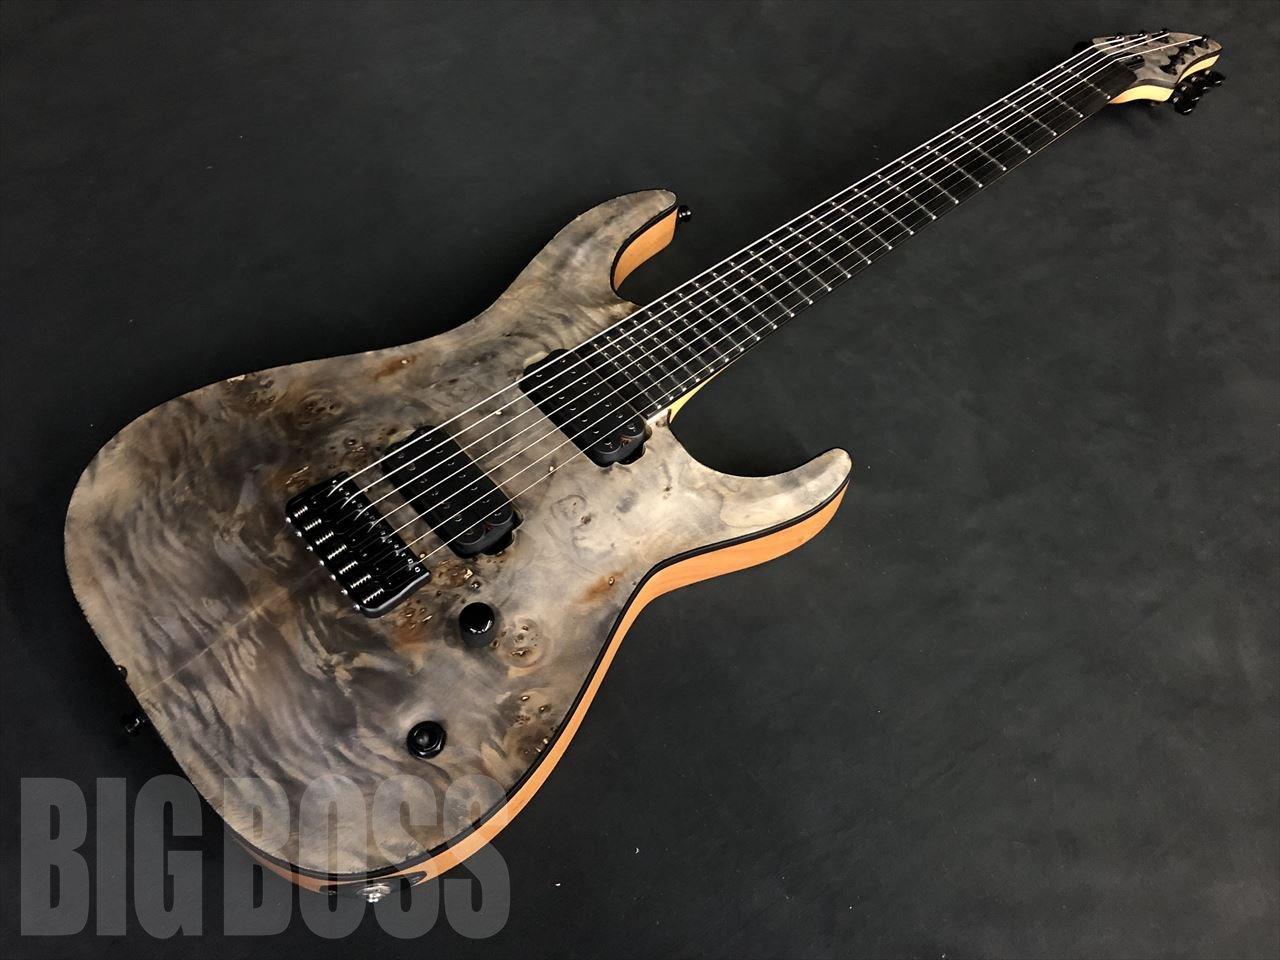 【即納可能】【新製品】EDWARDS E-HR7-FX/BM Ash Black【7弦ギター】